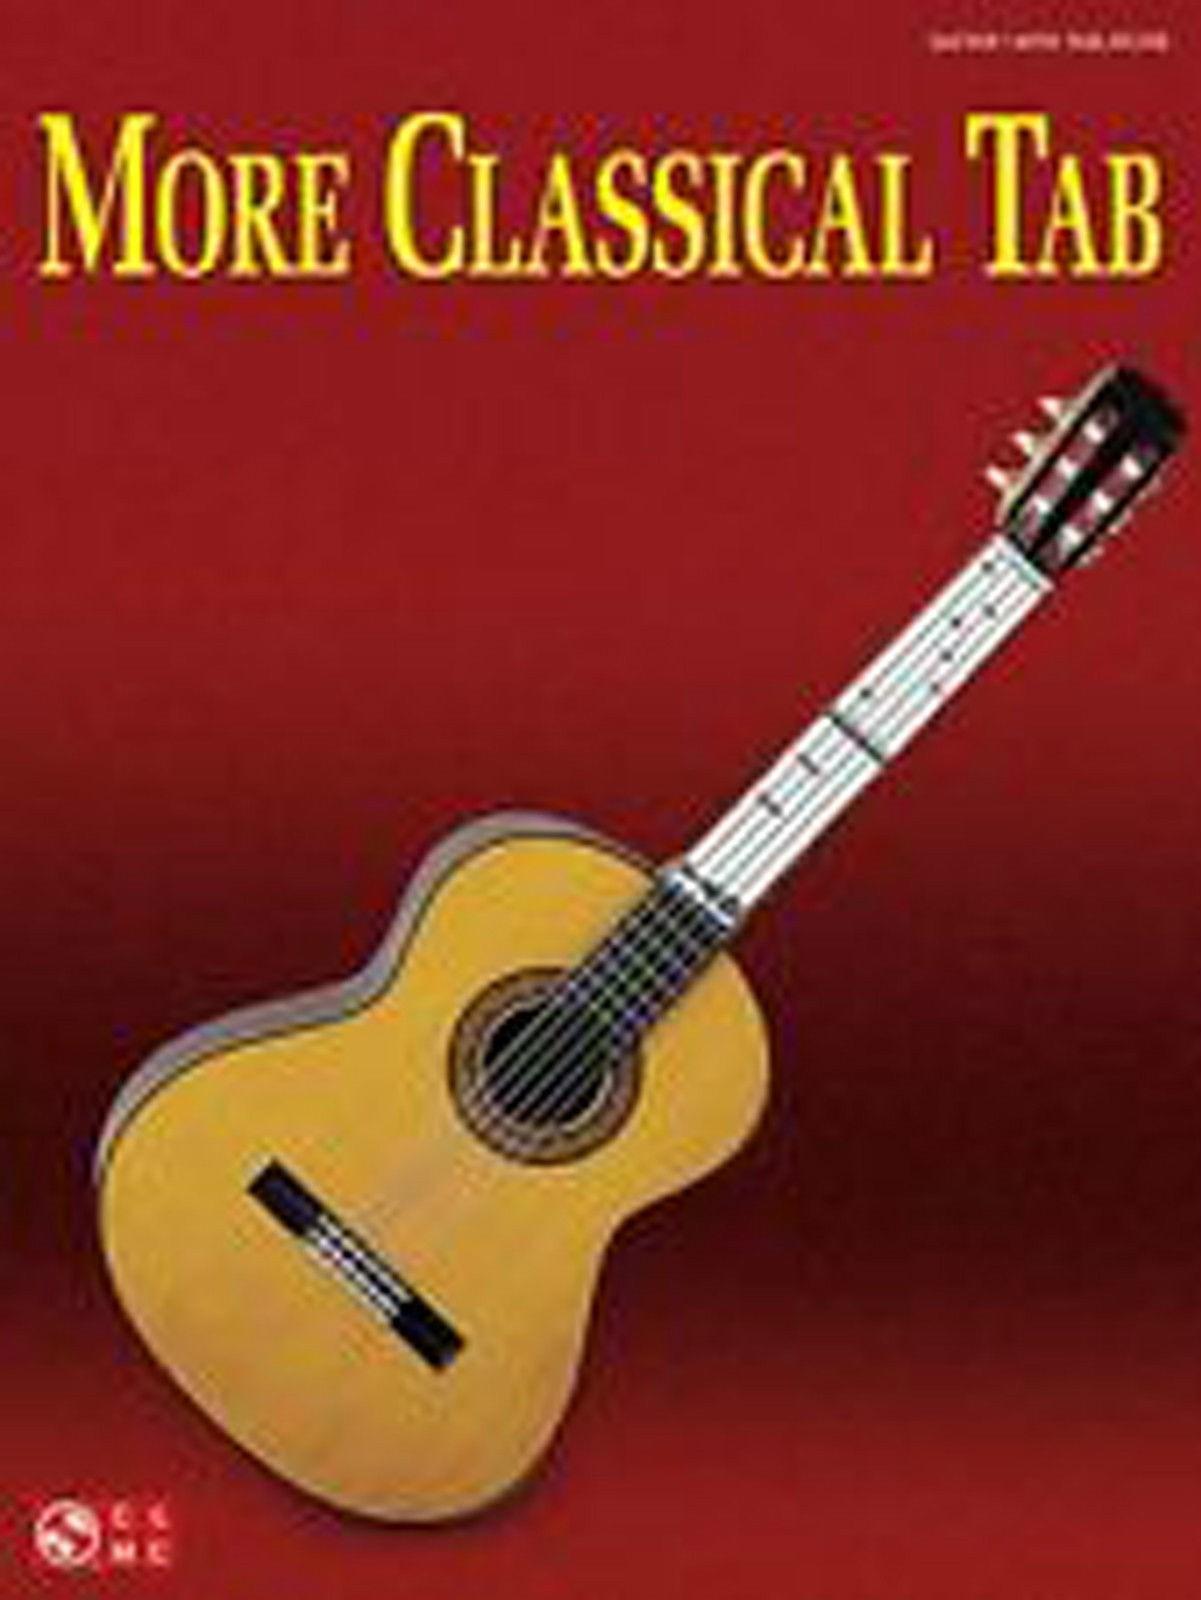 More Classical Tab Guitar Book Cherry Lane Music B44